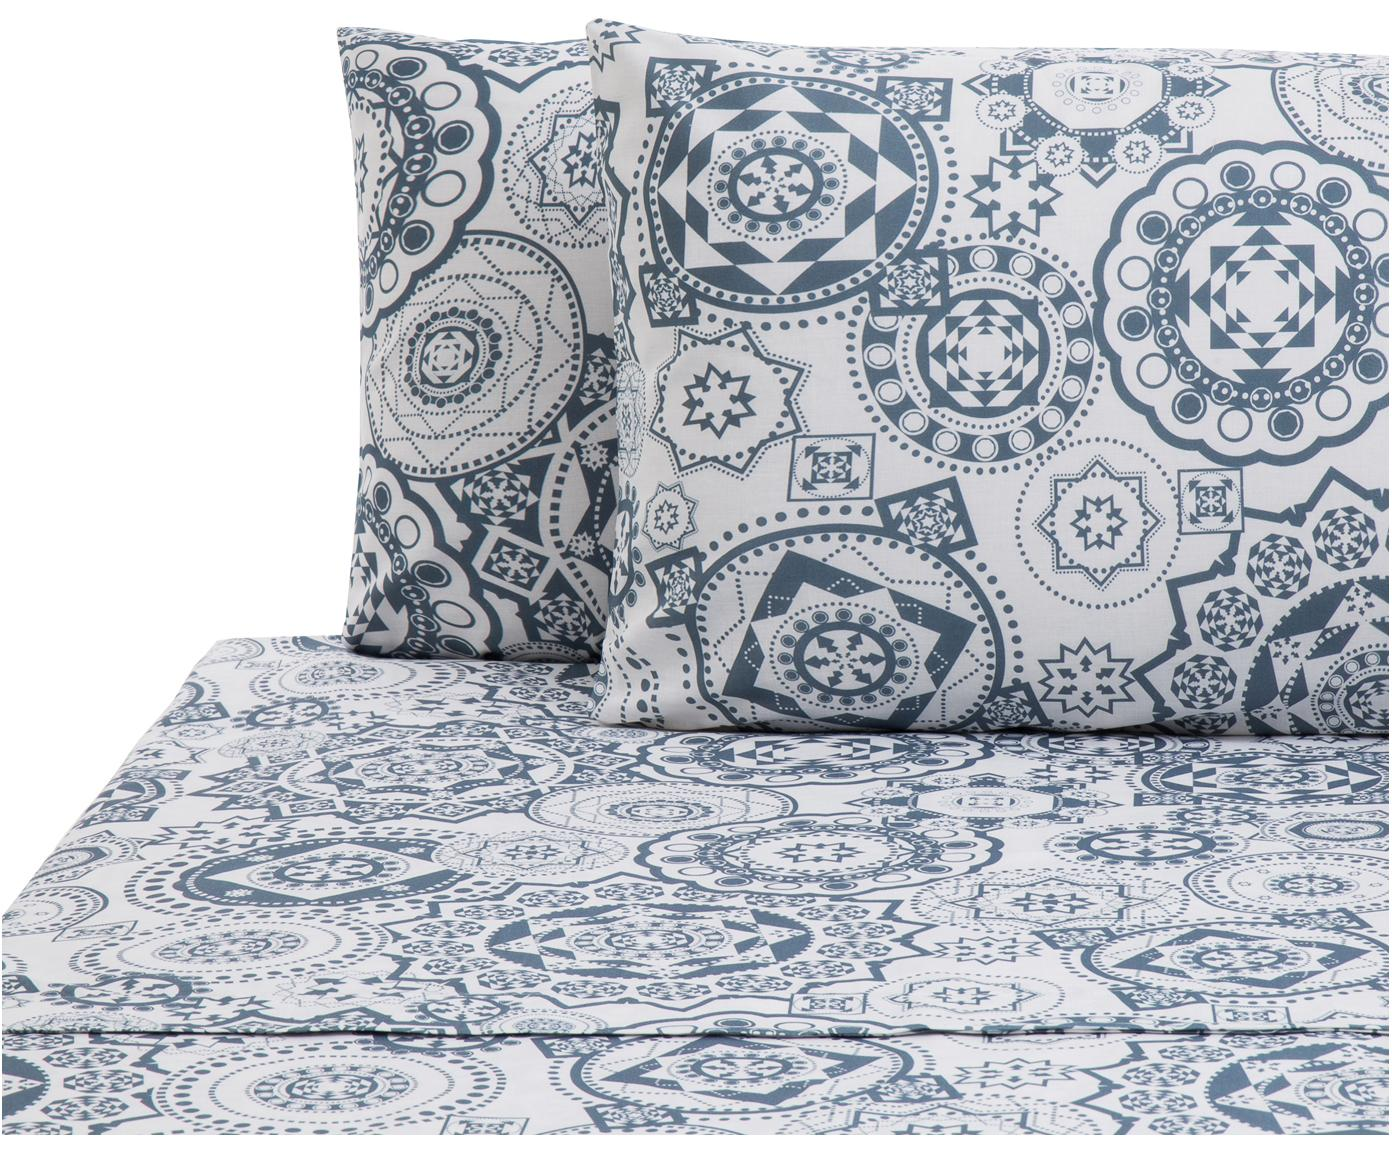 Set lenzuola in cotone Morris 2 pz, Cotone, Fronte: blu, bianco Retro: bianco, 240 x 270 cm